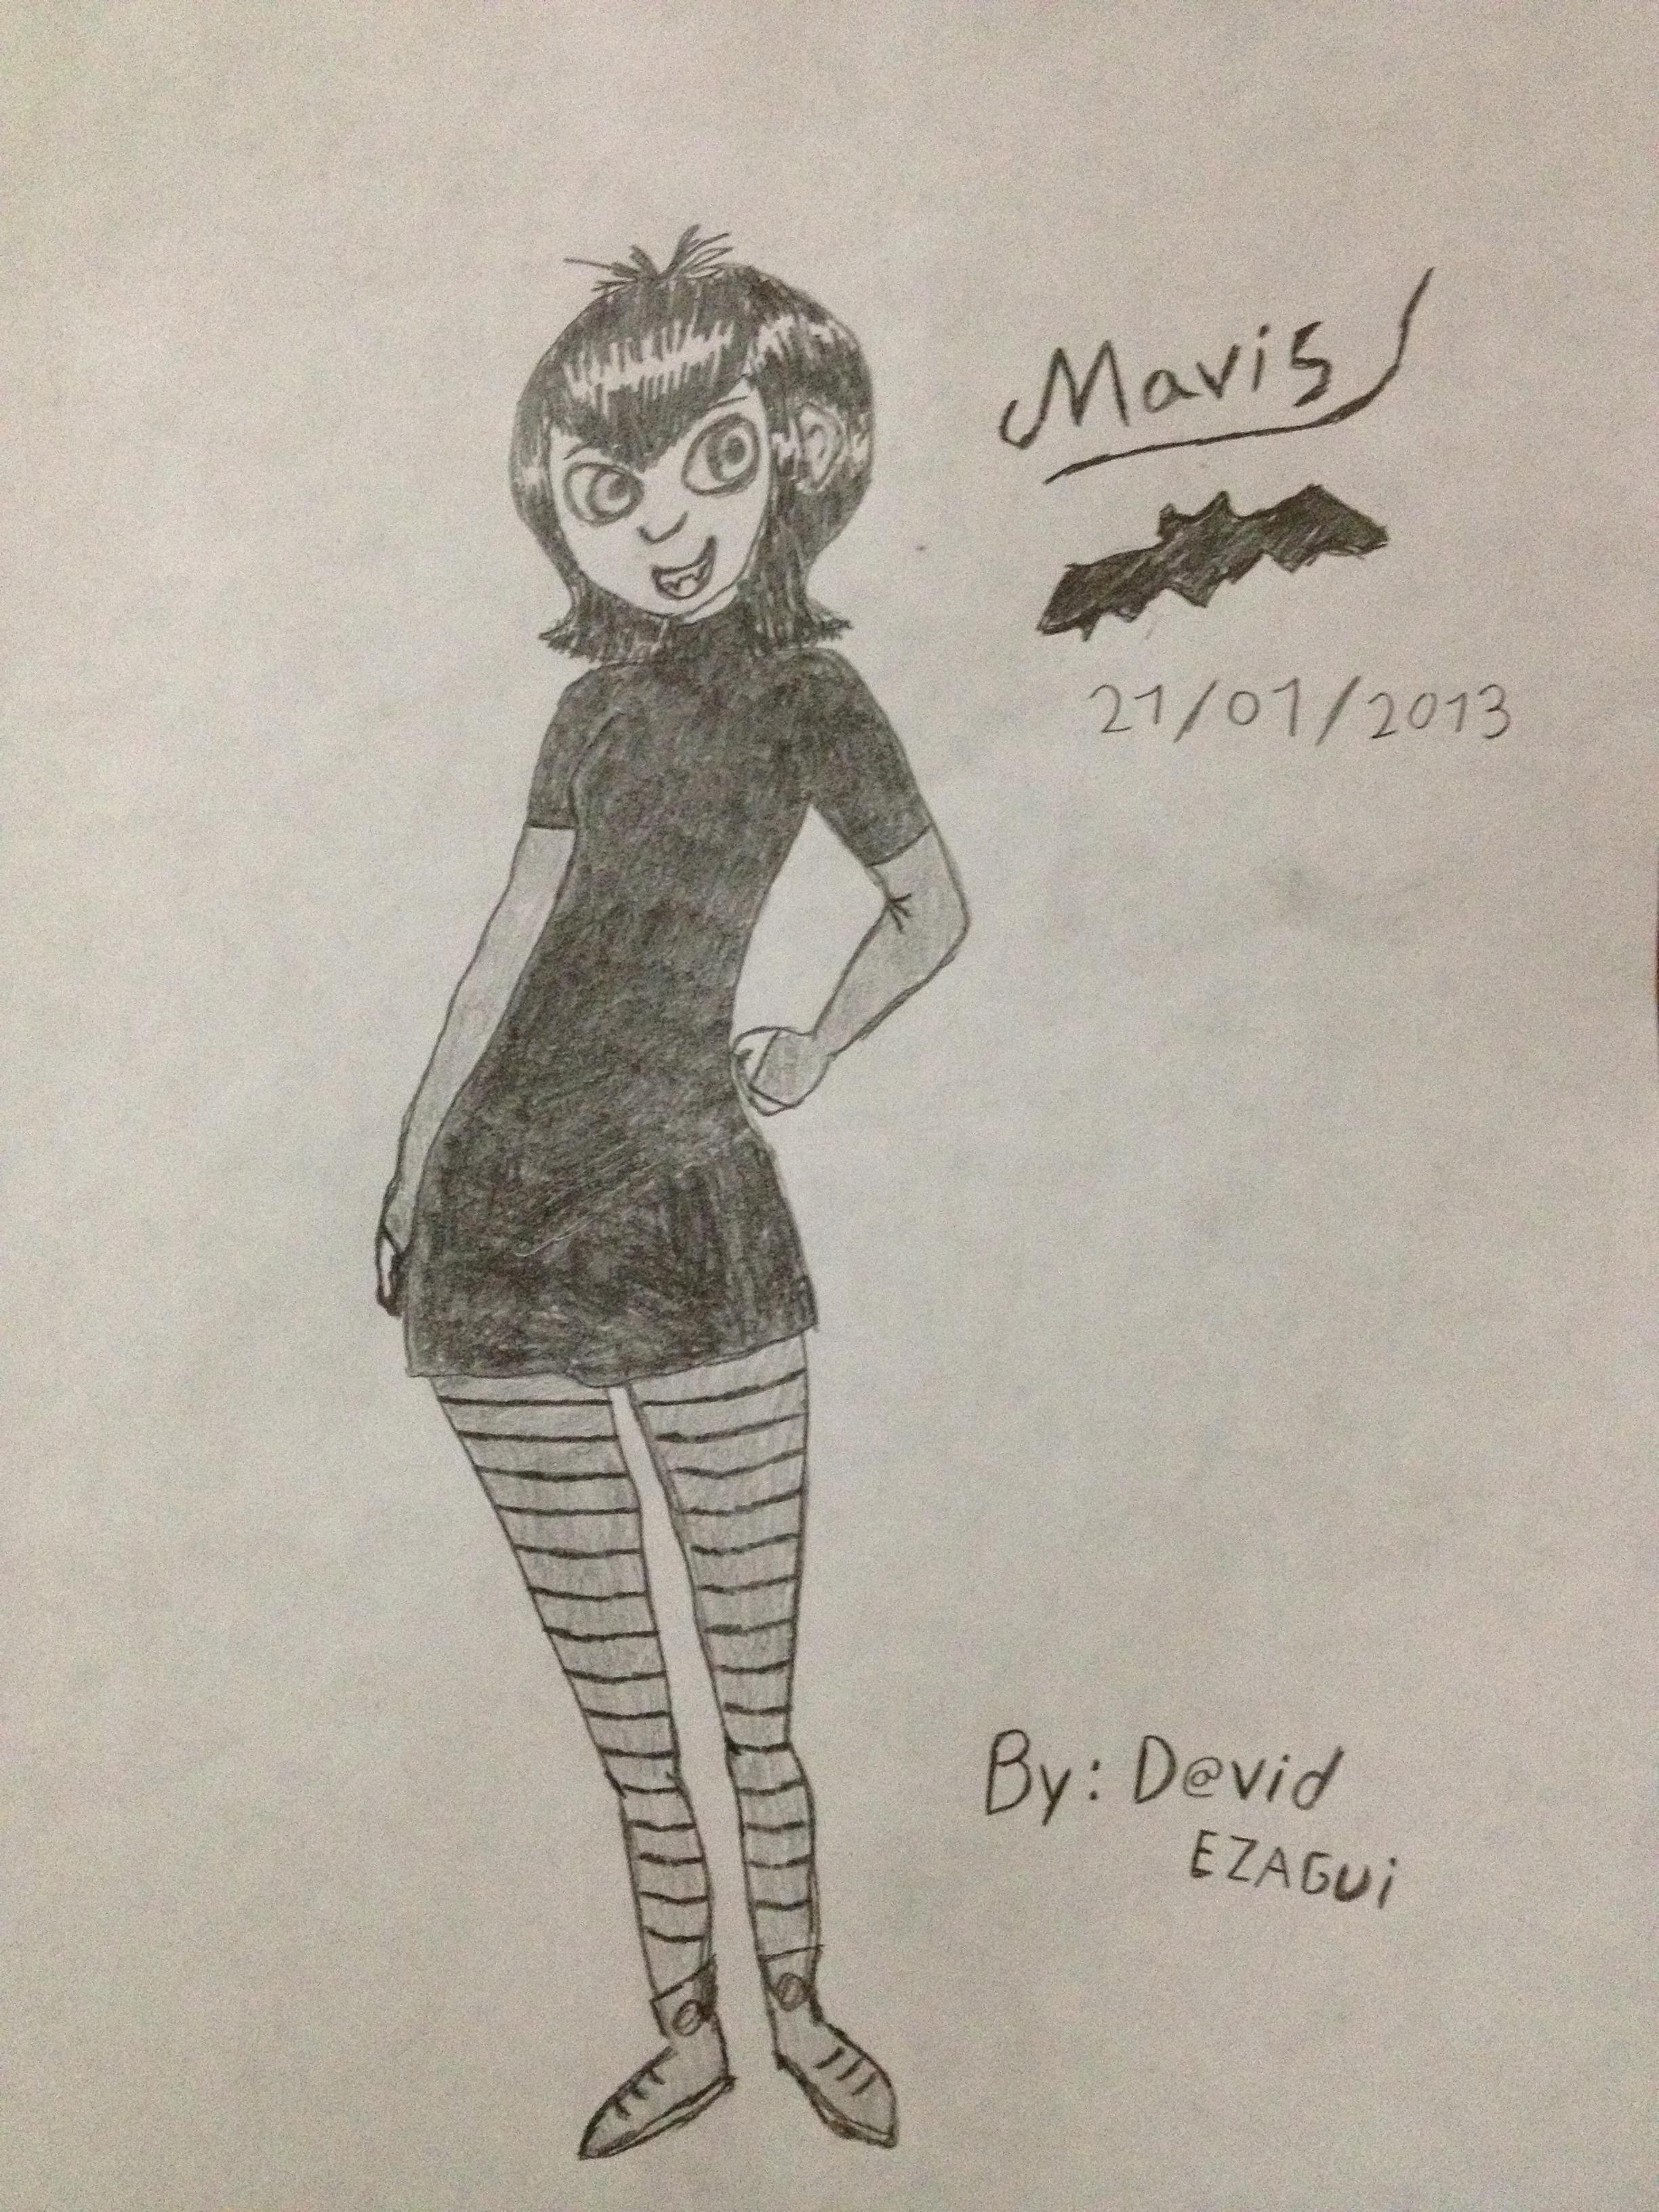 Mavis dracula - my drawing :3 by ezagui123